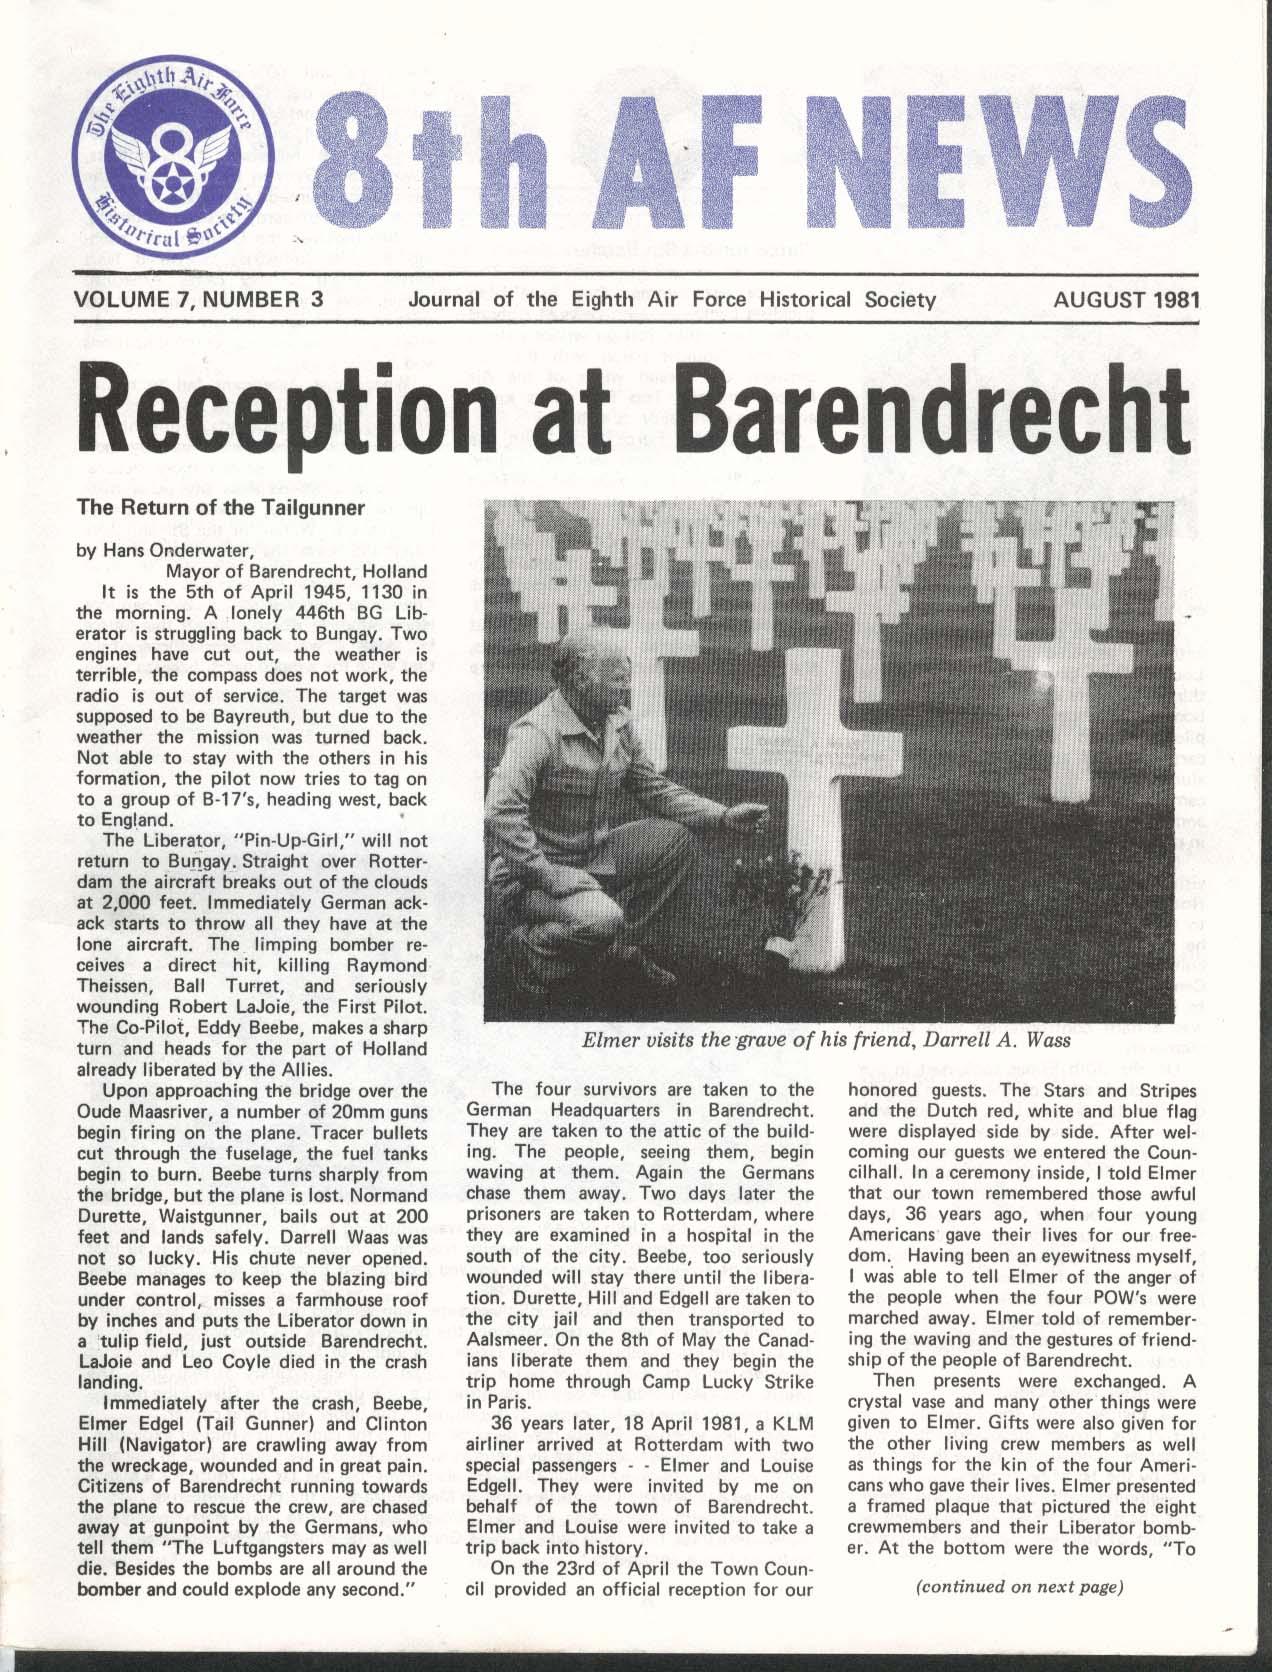 8th AF NEWS Hans Onderwater Elmer Edgel Manchester Misses Air Force ++ 8 1981